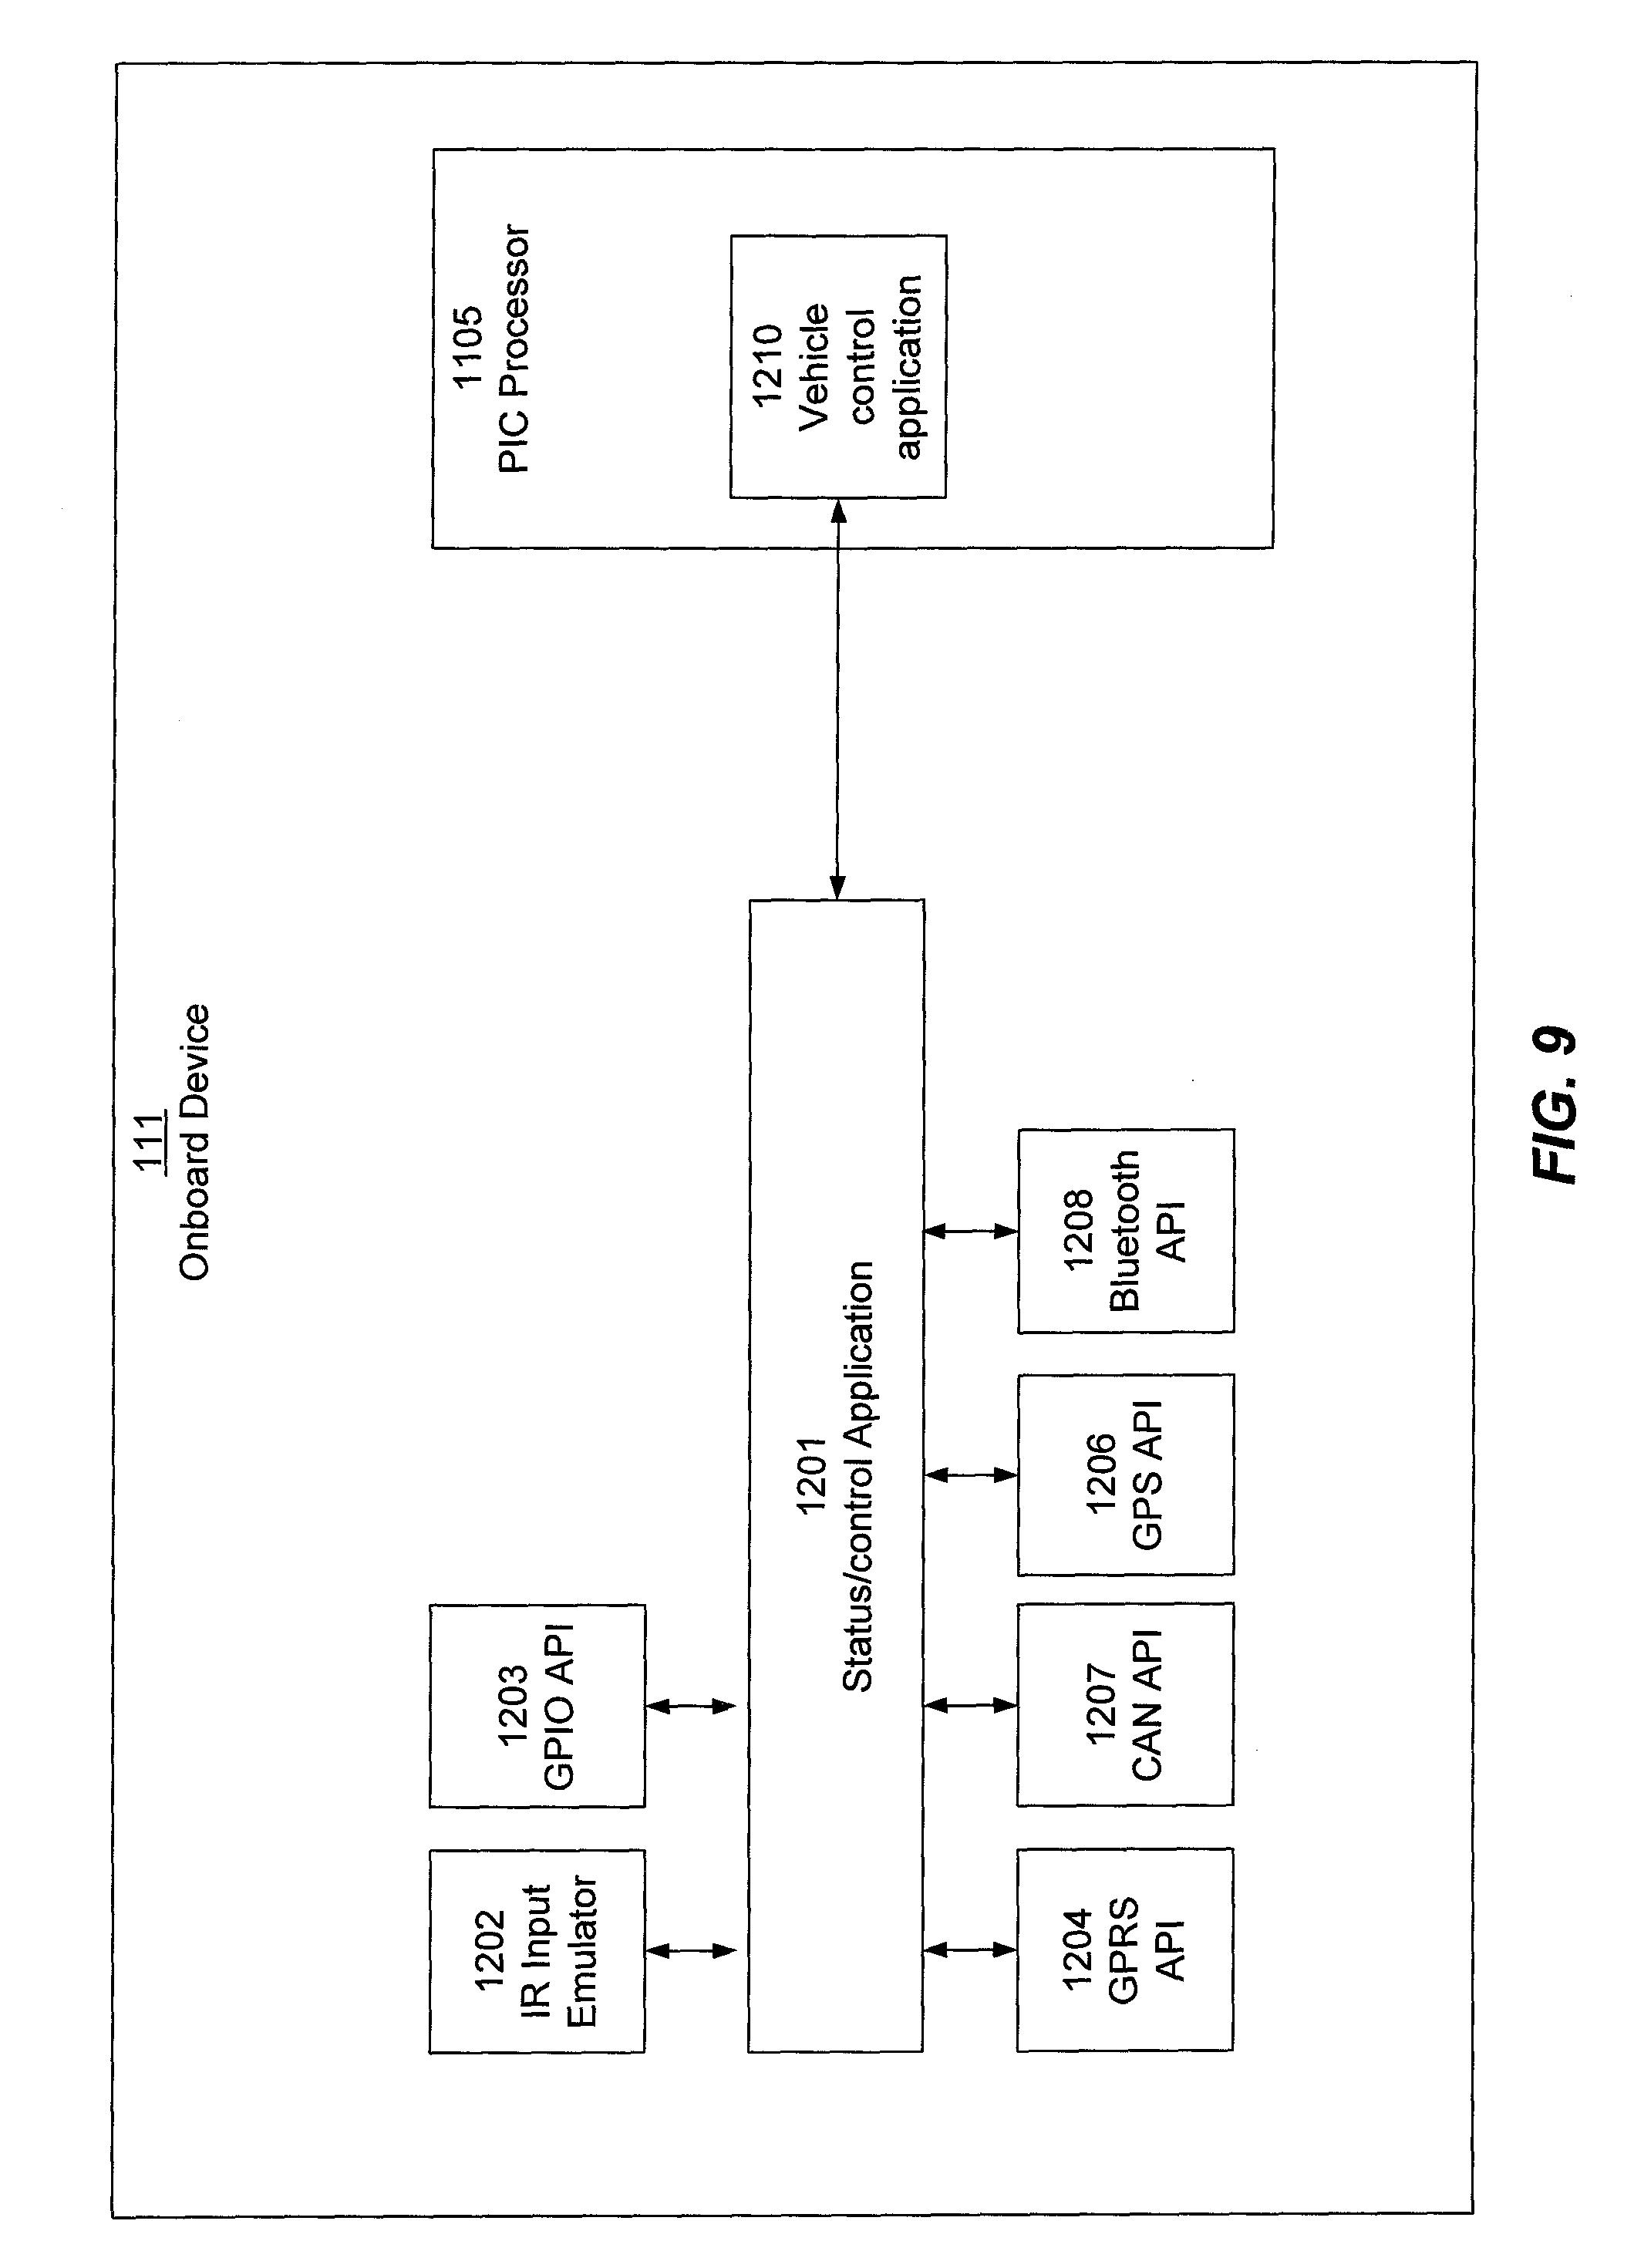 passtime wiring diagram plant animal cell venn trax 4v gallery